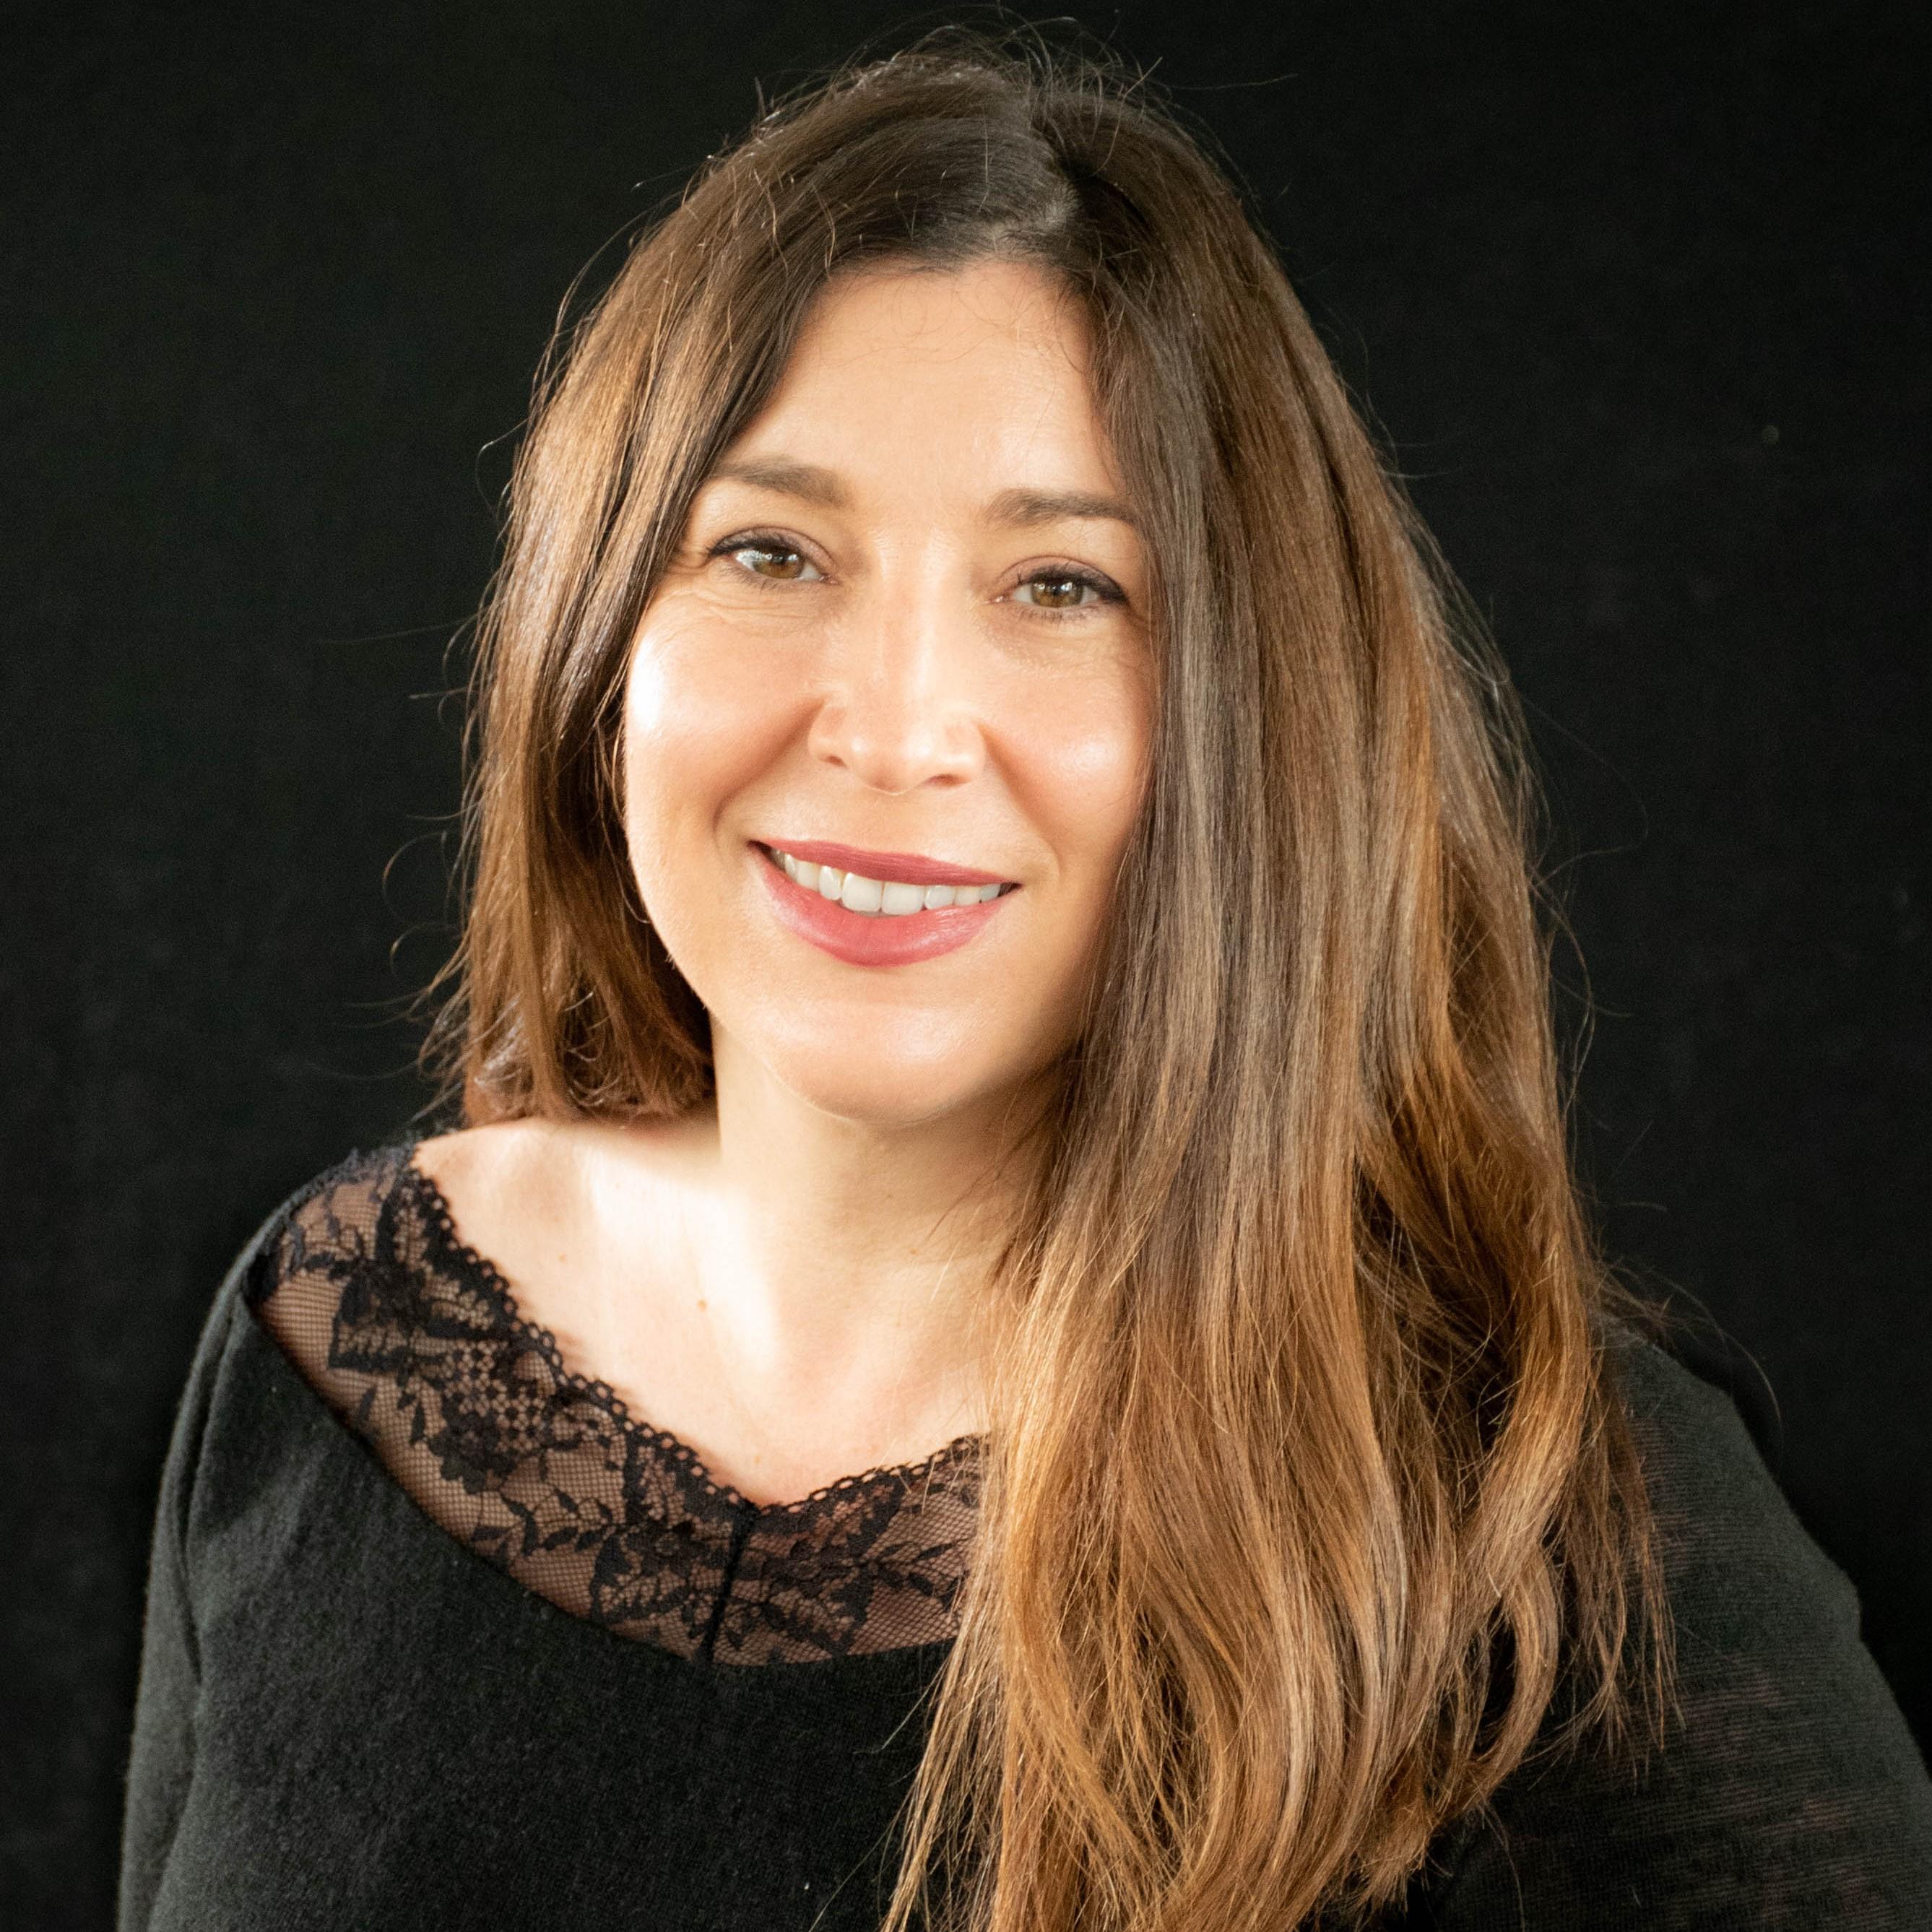 Heidi Haga